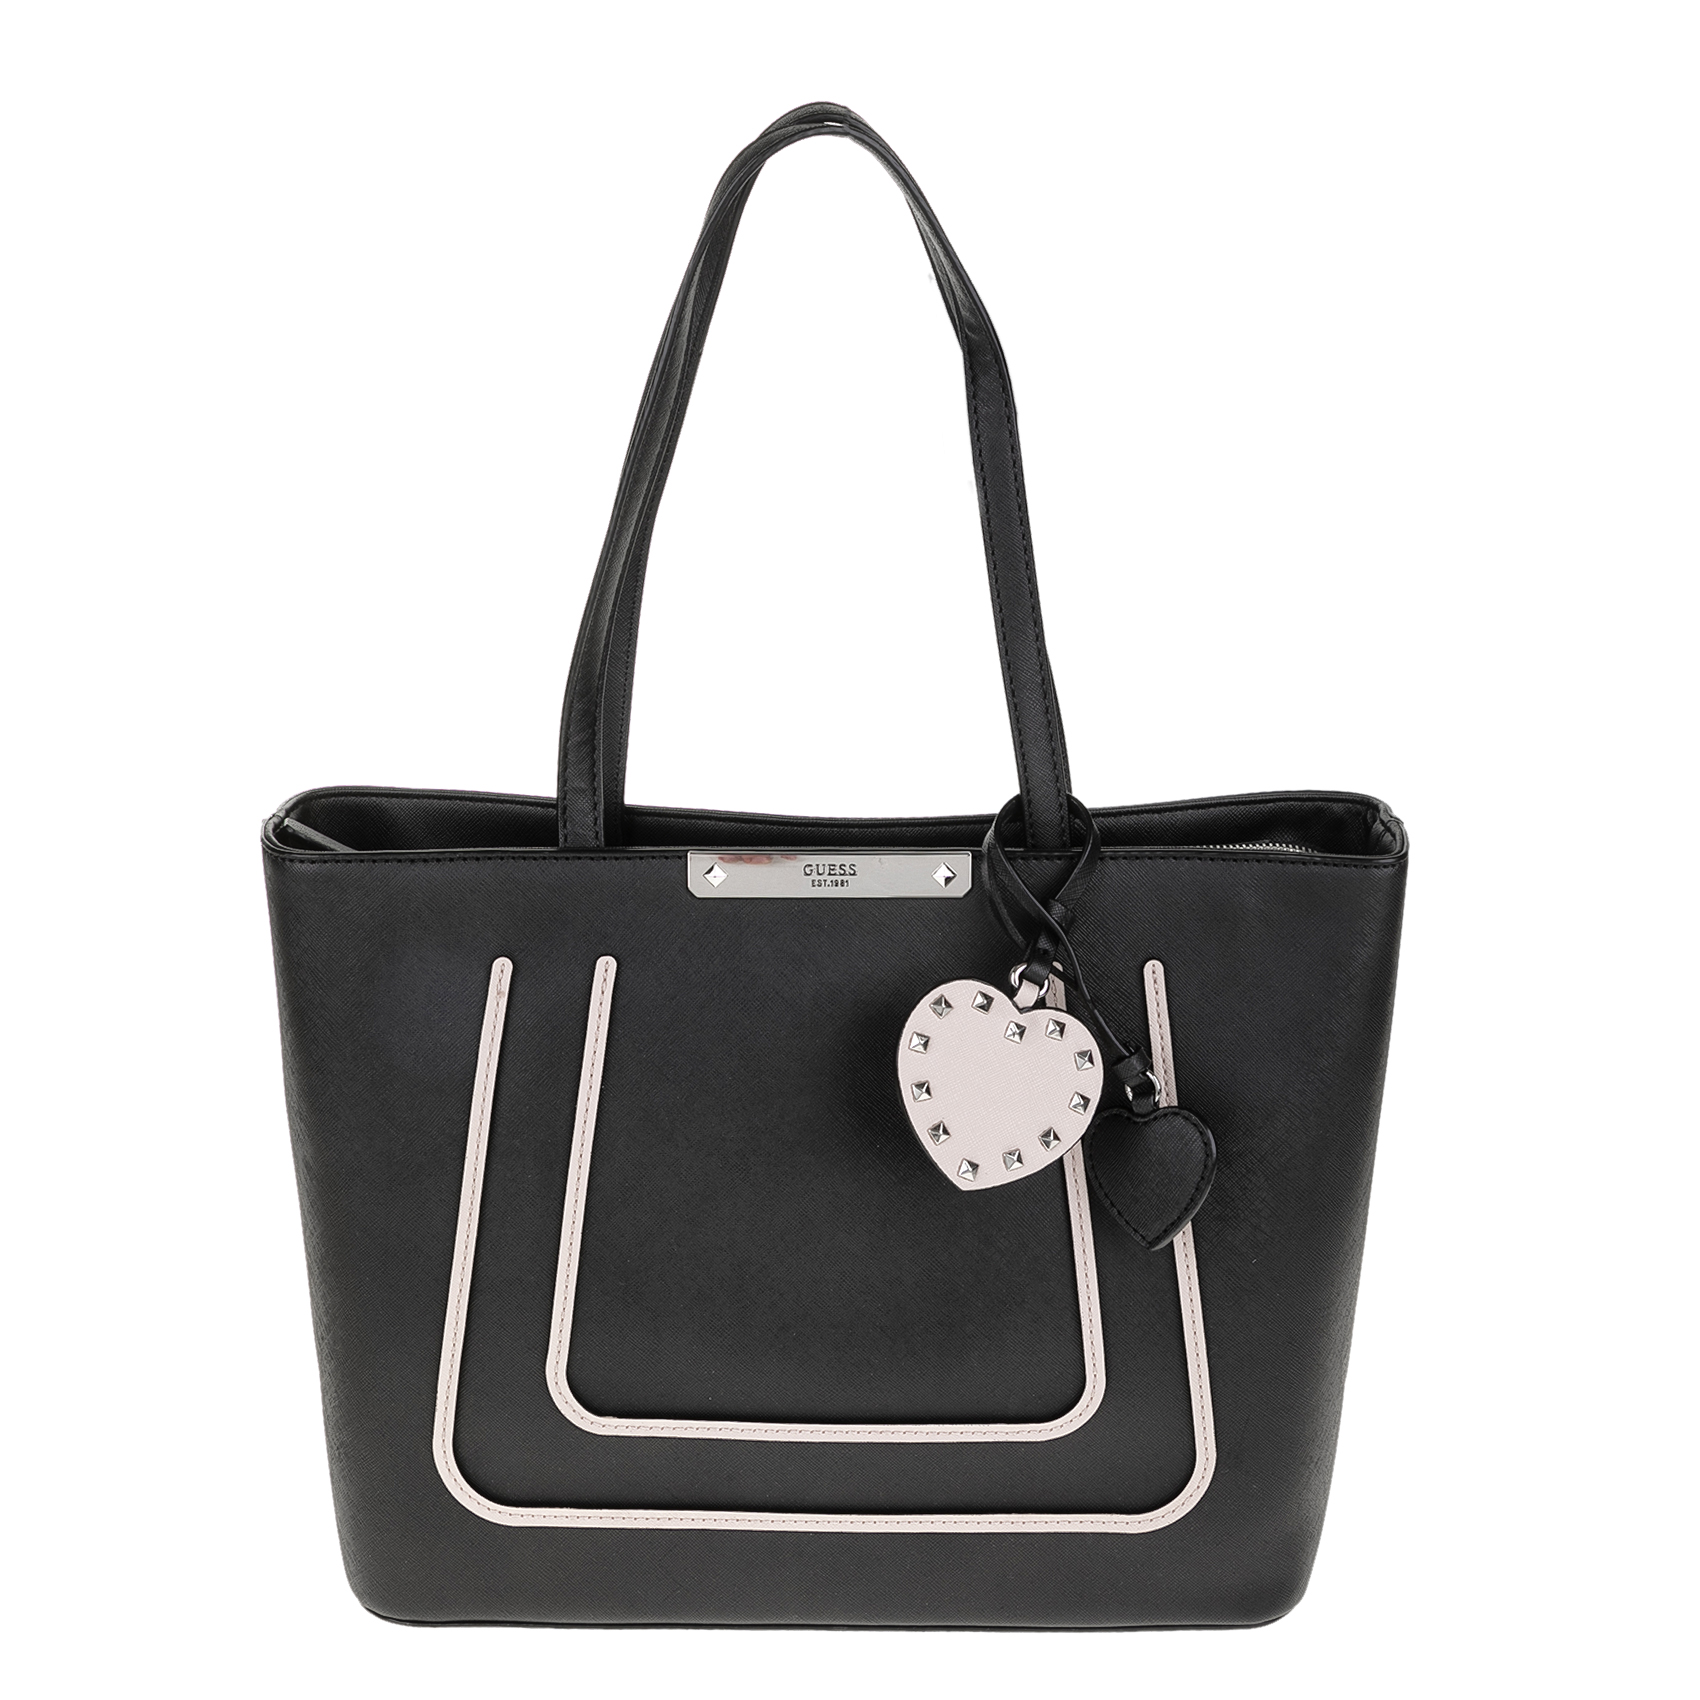 GUESS – Γυναικεία τσάντα GUESS BRITTA μαύρη 1571469.0-7191